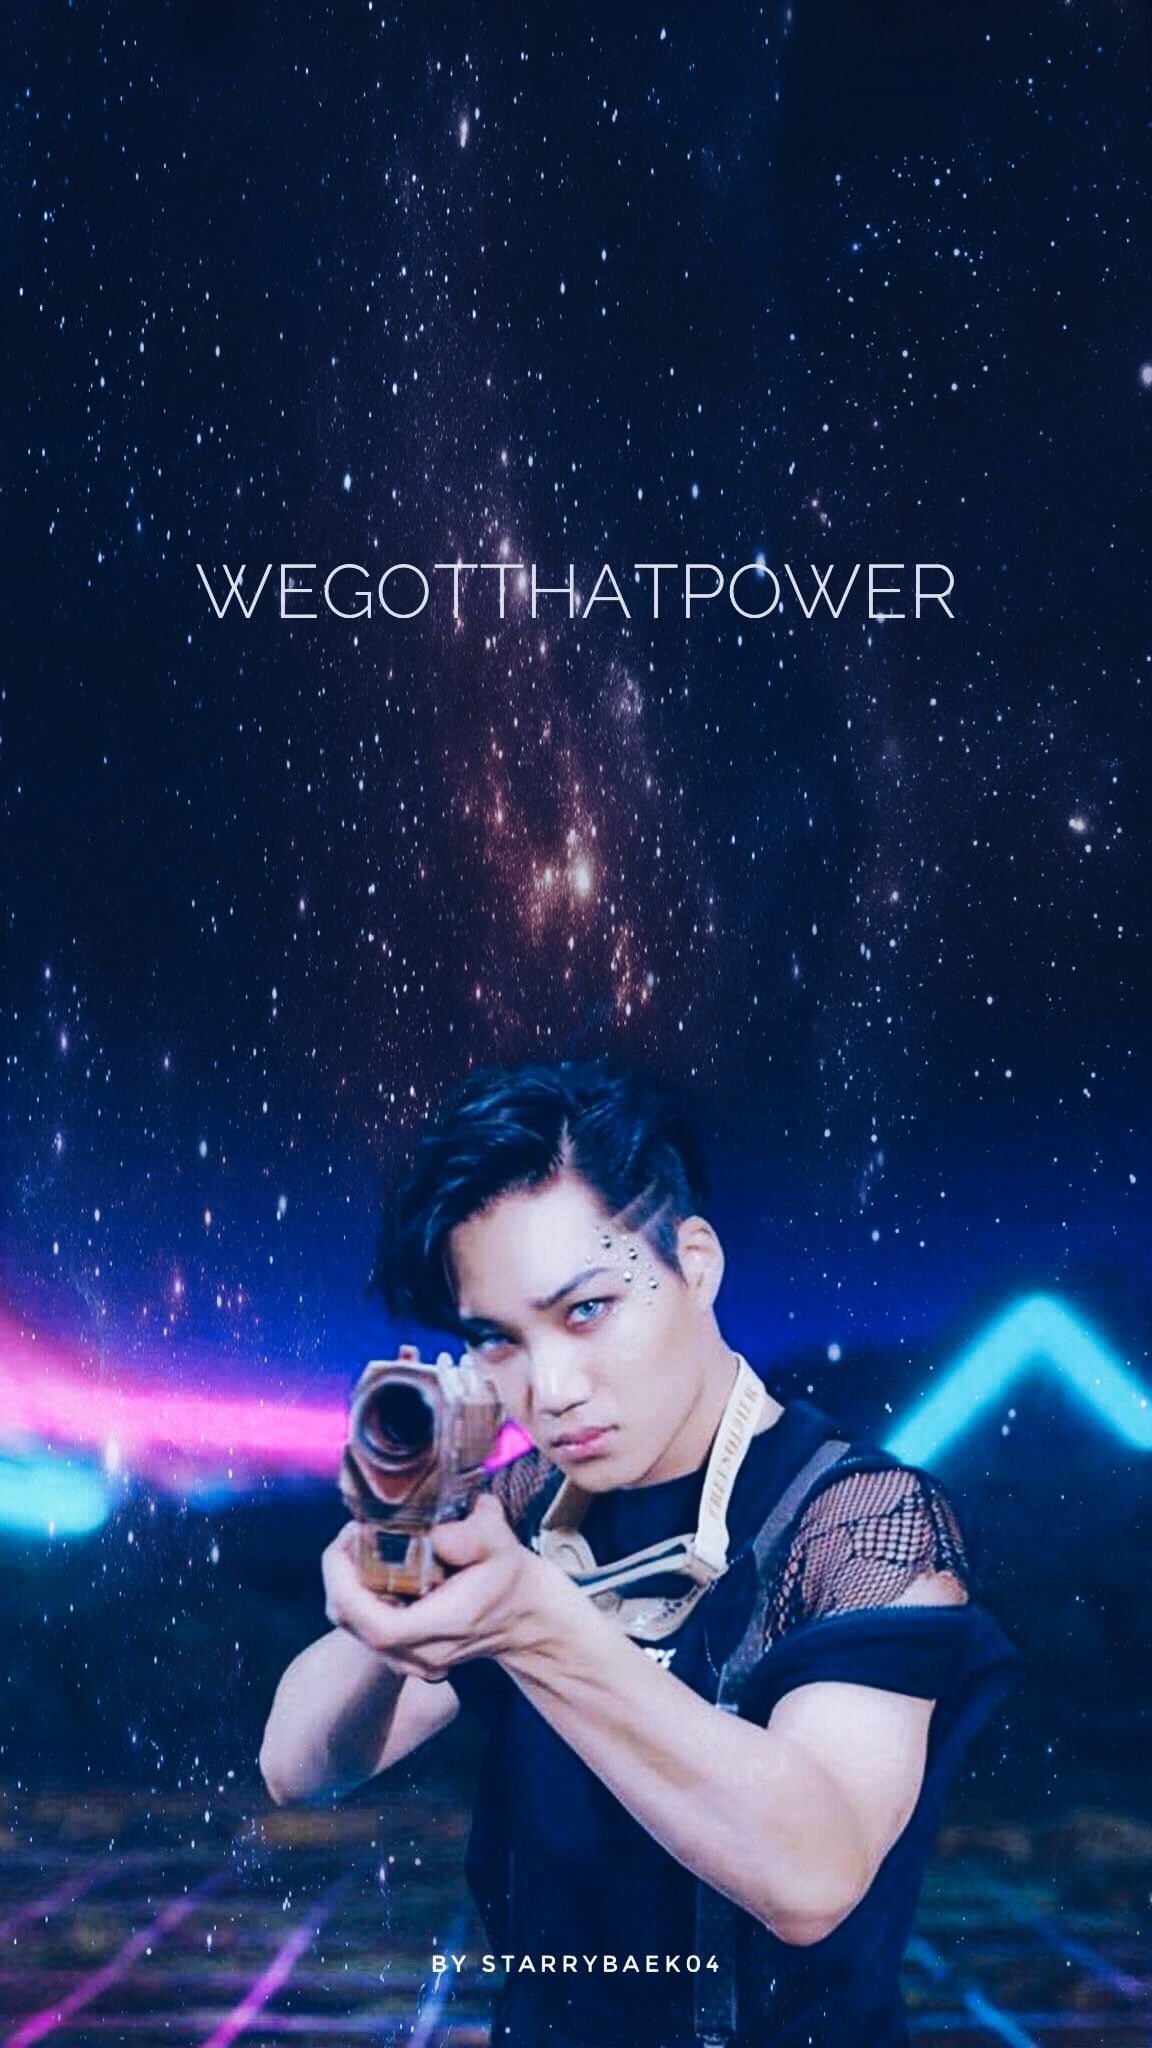 Exo Repackaged The Power Of Music Wallpaper C To Starrybaek04 Exo Kai Comeback Thewar Powerofmusic 엑소 Kpop